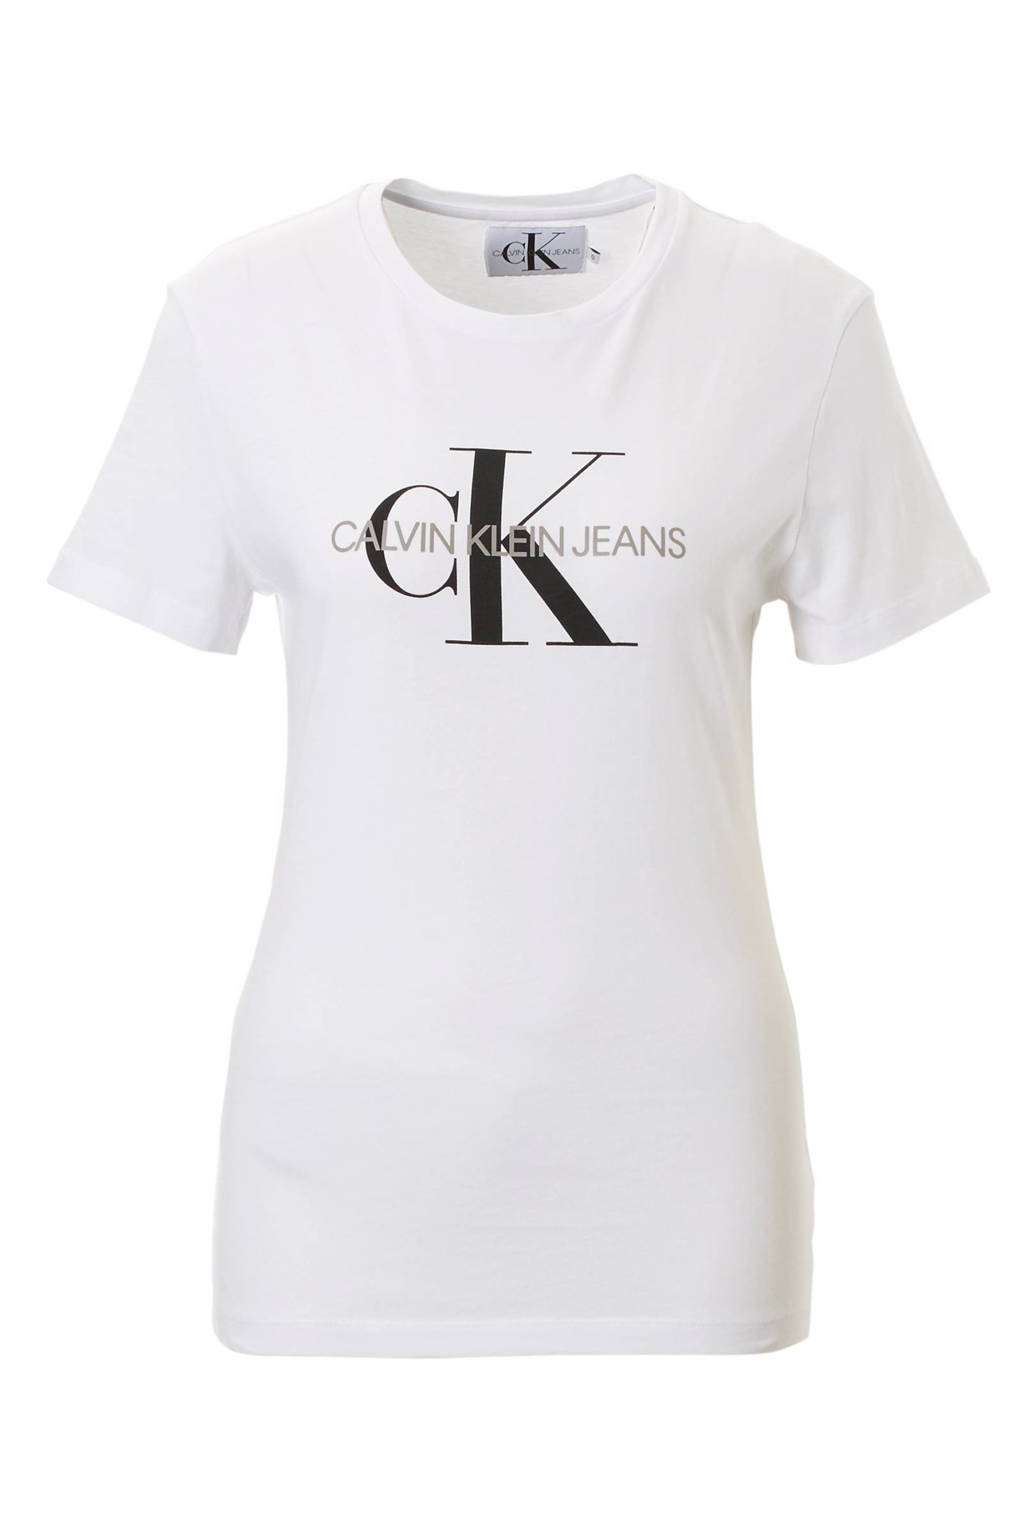 CALVIN KLEIN JEANS T-shirt, Wit